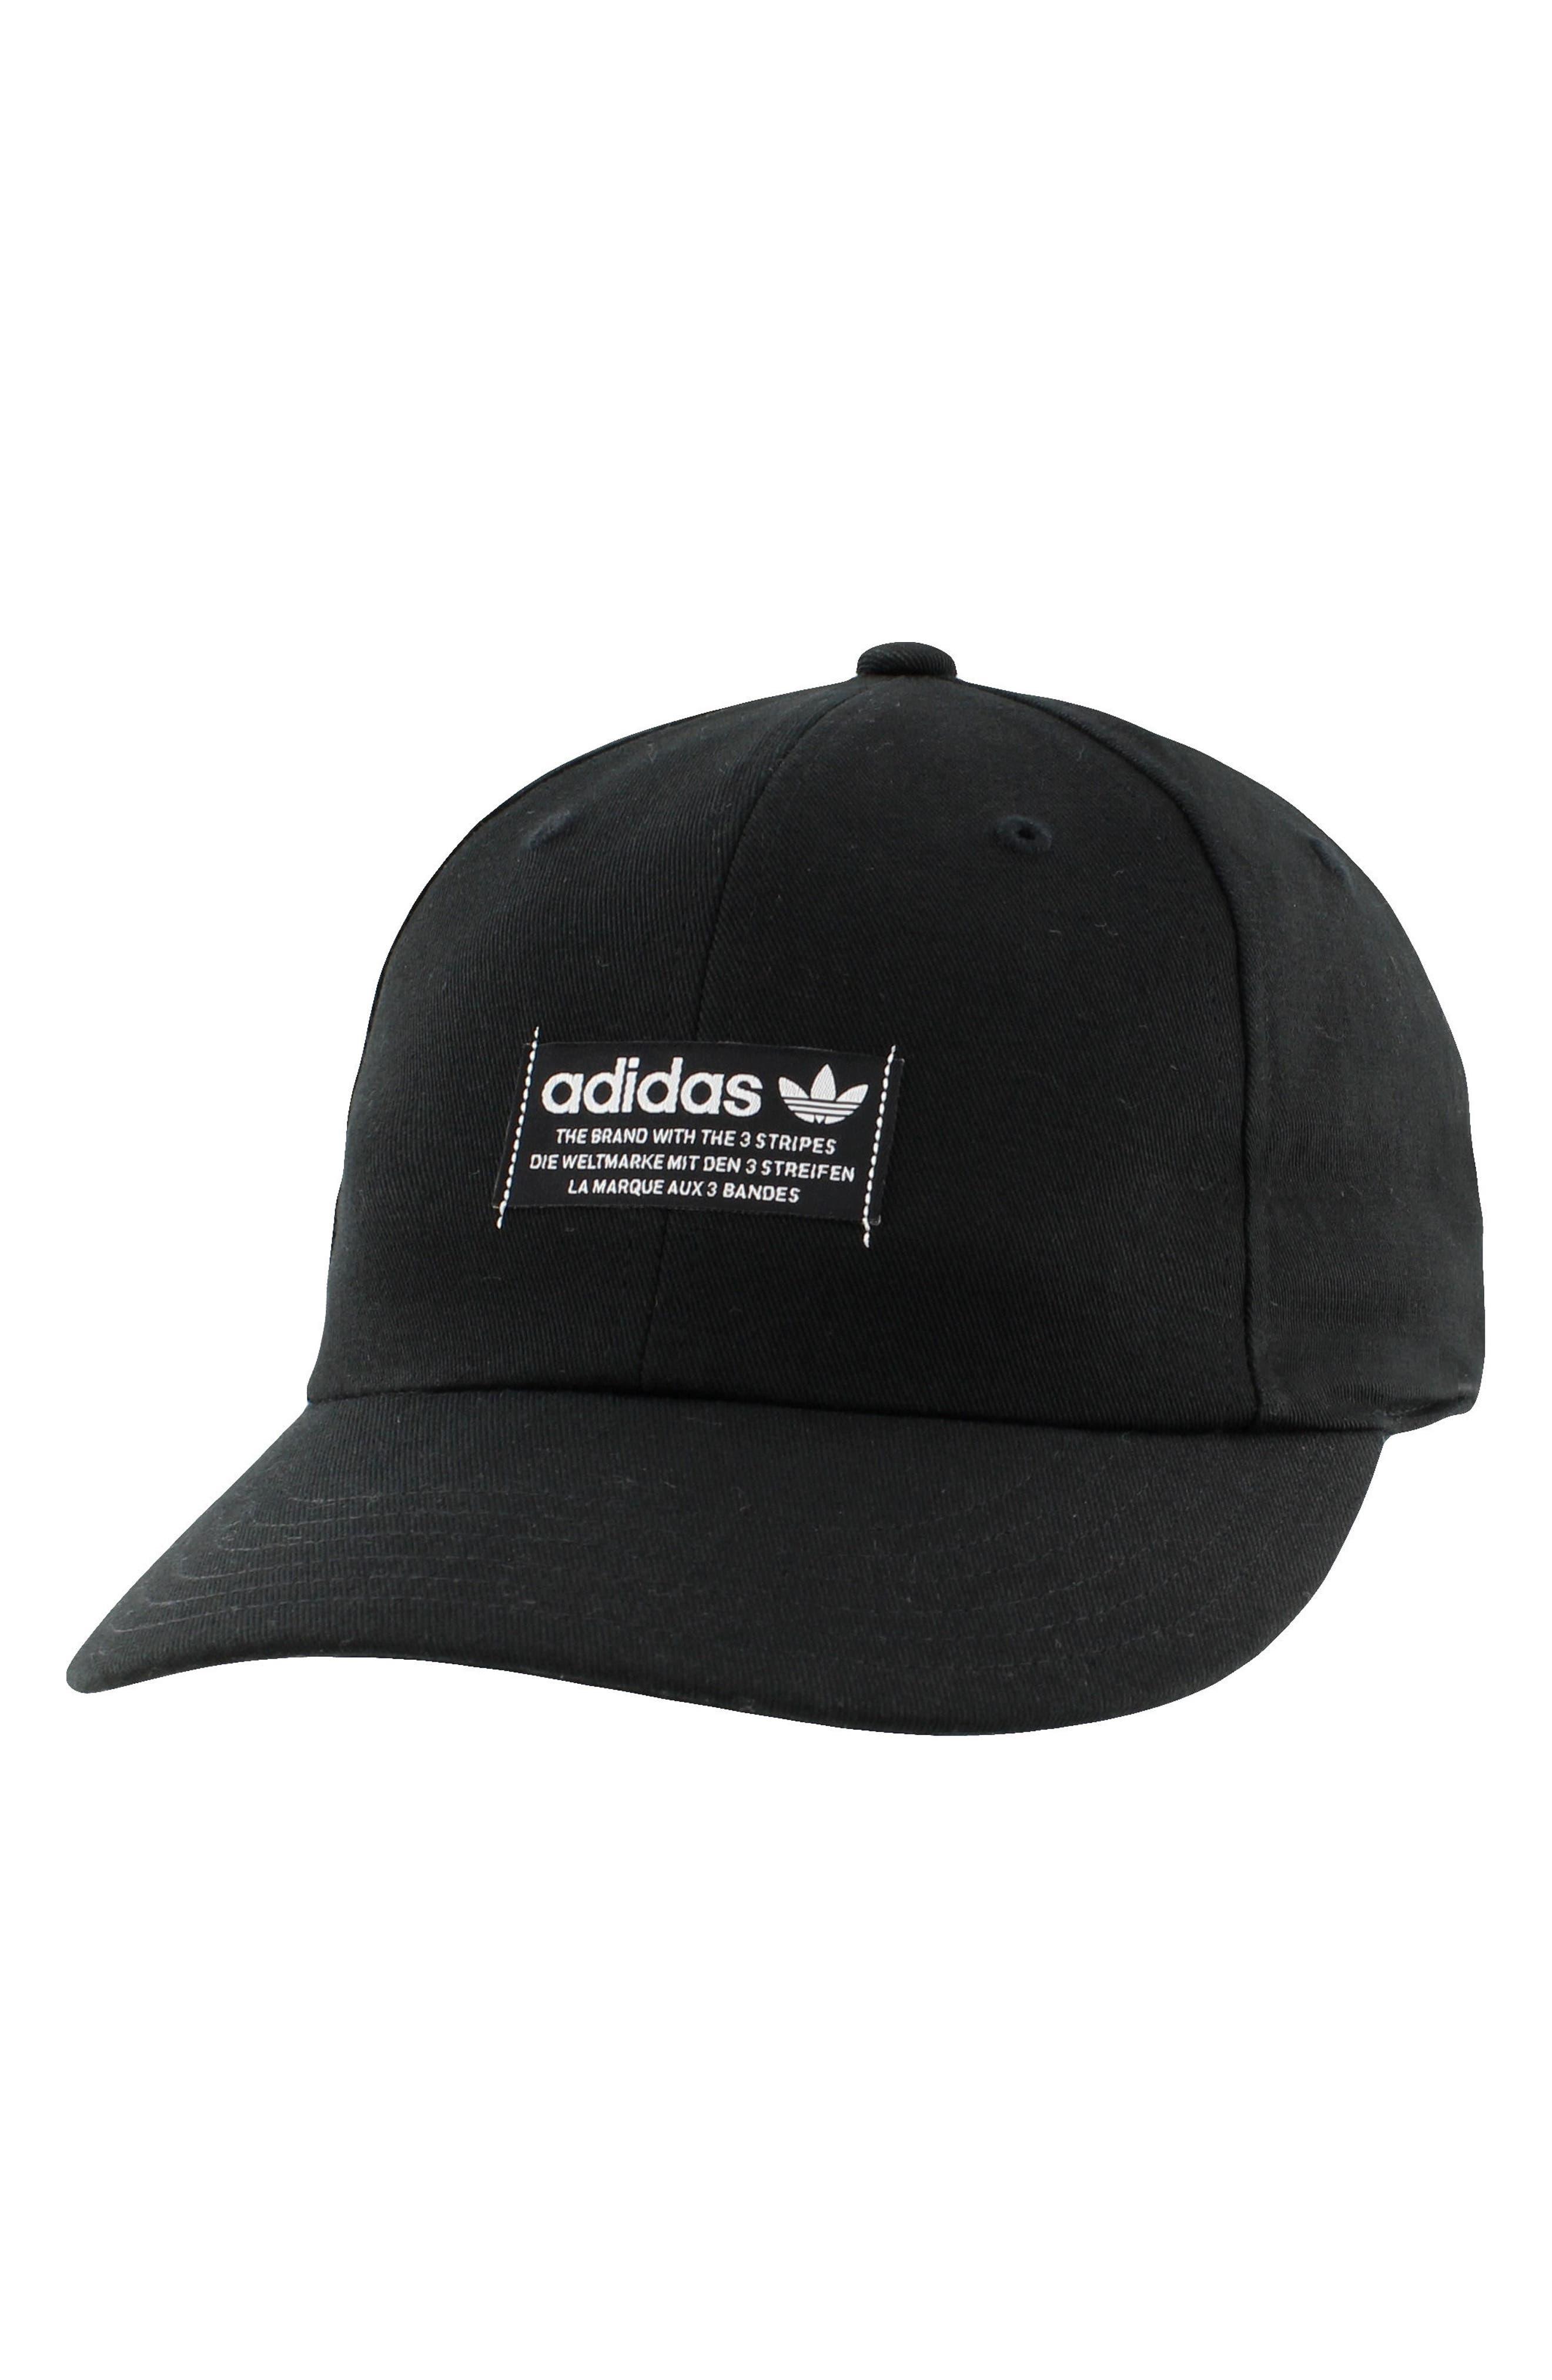 adidas Original Relaxed Patch Ball Cap,                         Main,                         color, Black